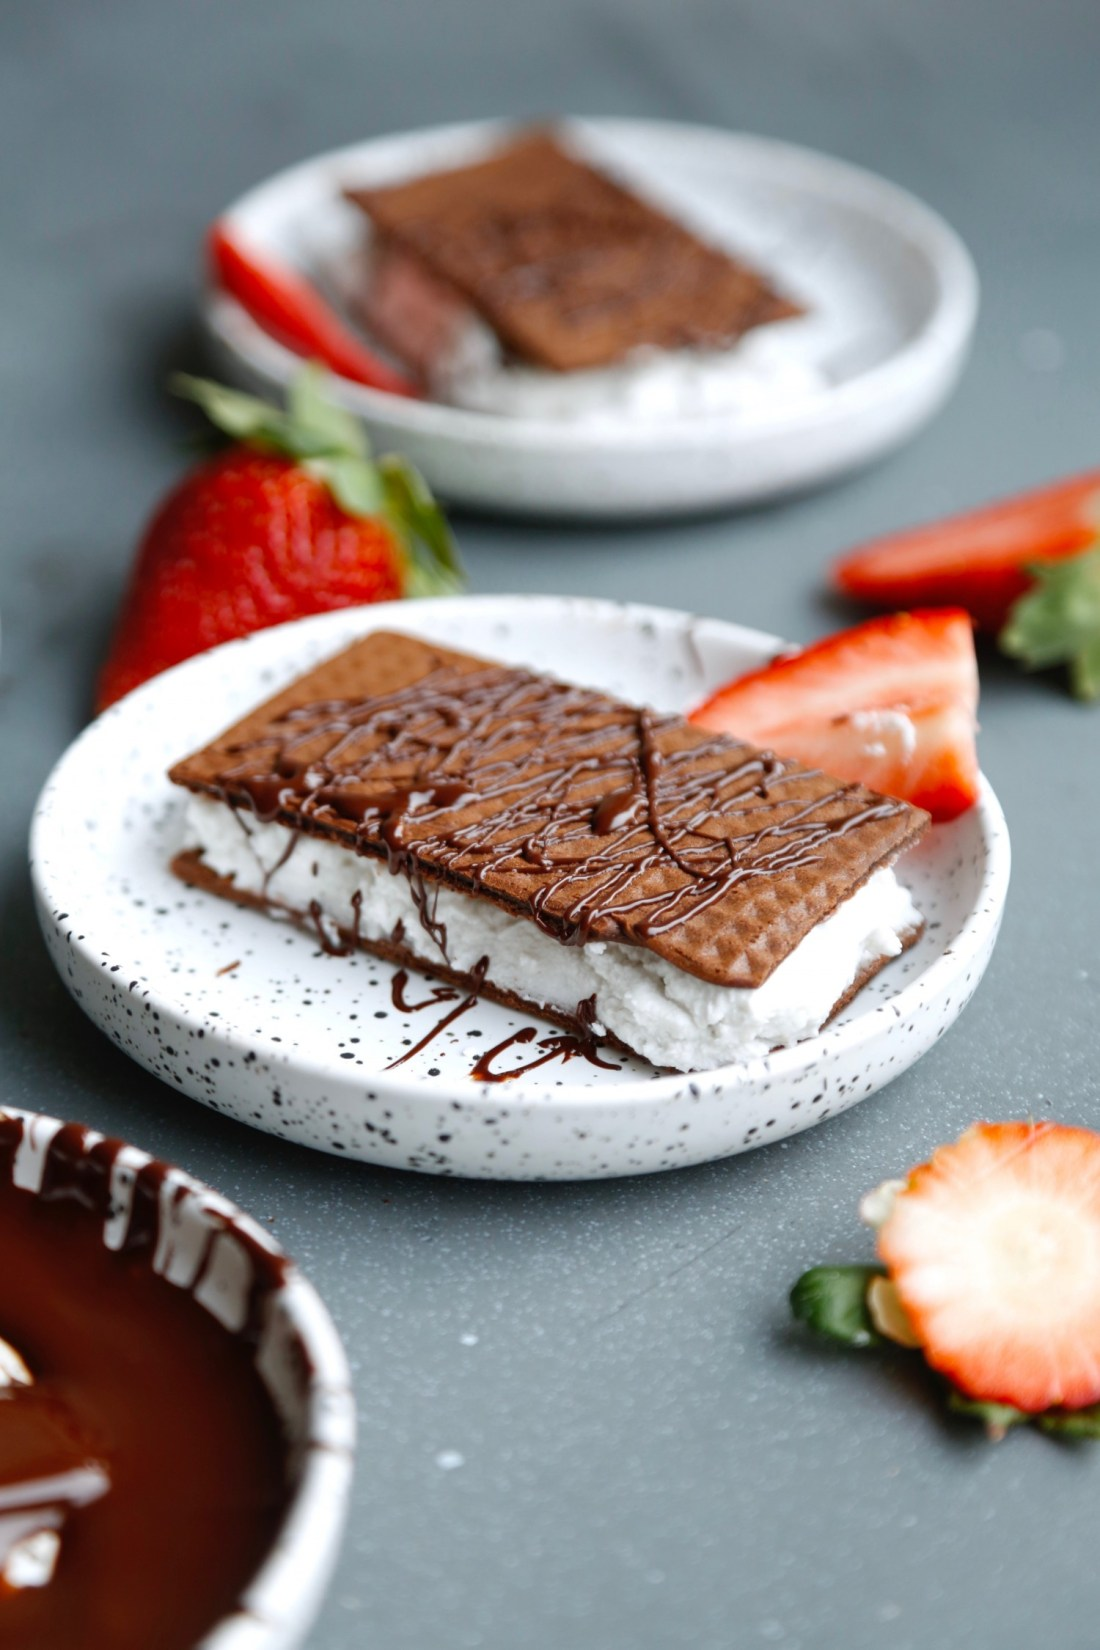 vaffelsandwich-chokoladevafler-med-kokosskum-ala-maelkesnitte-3